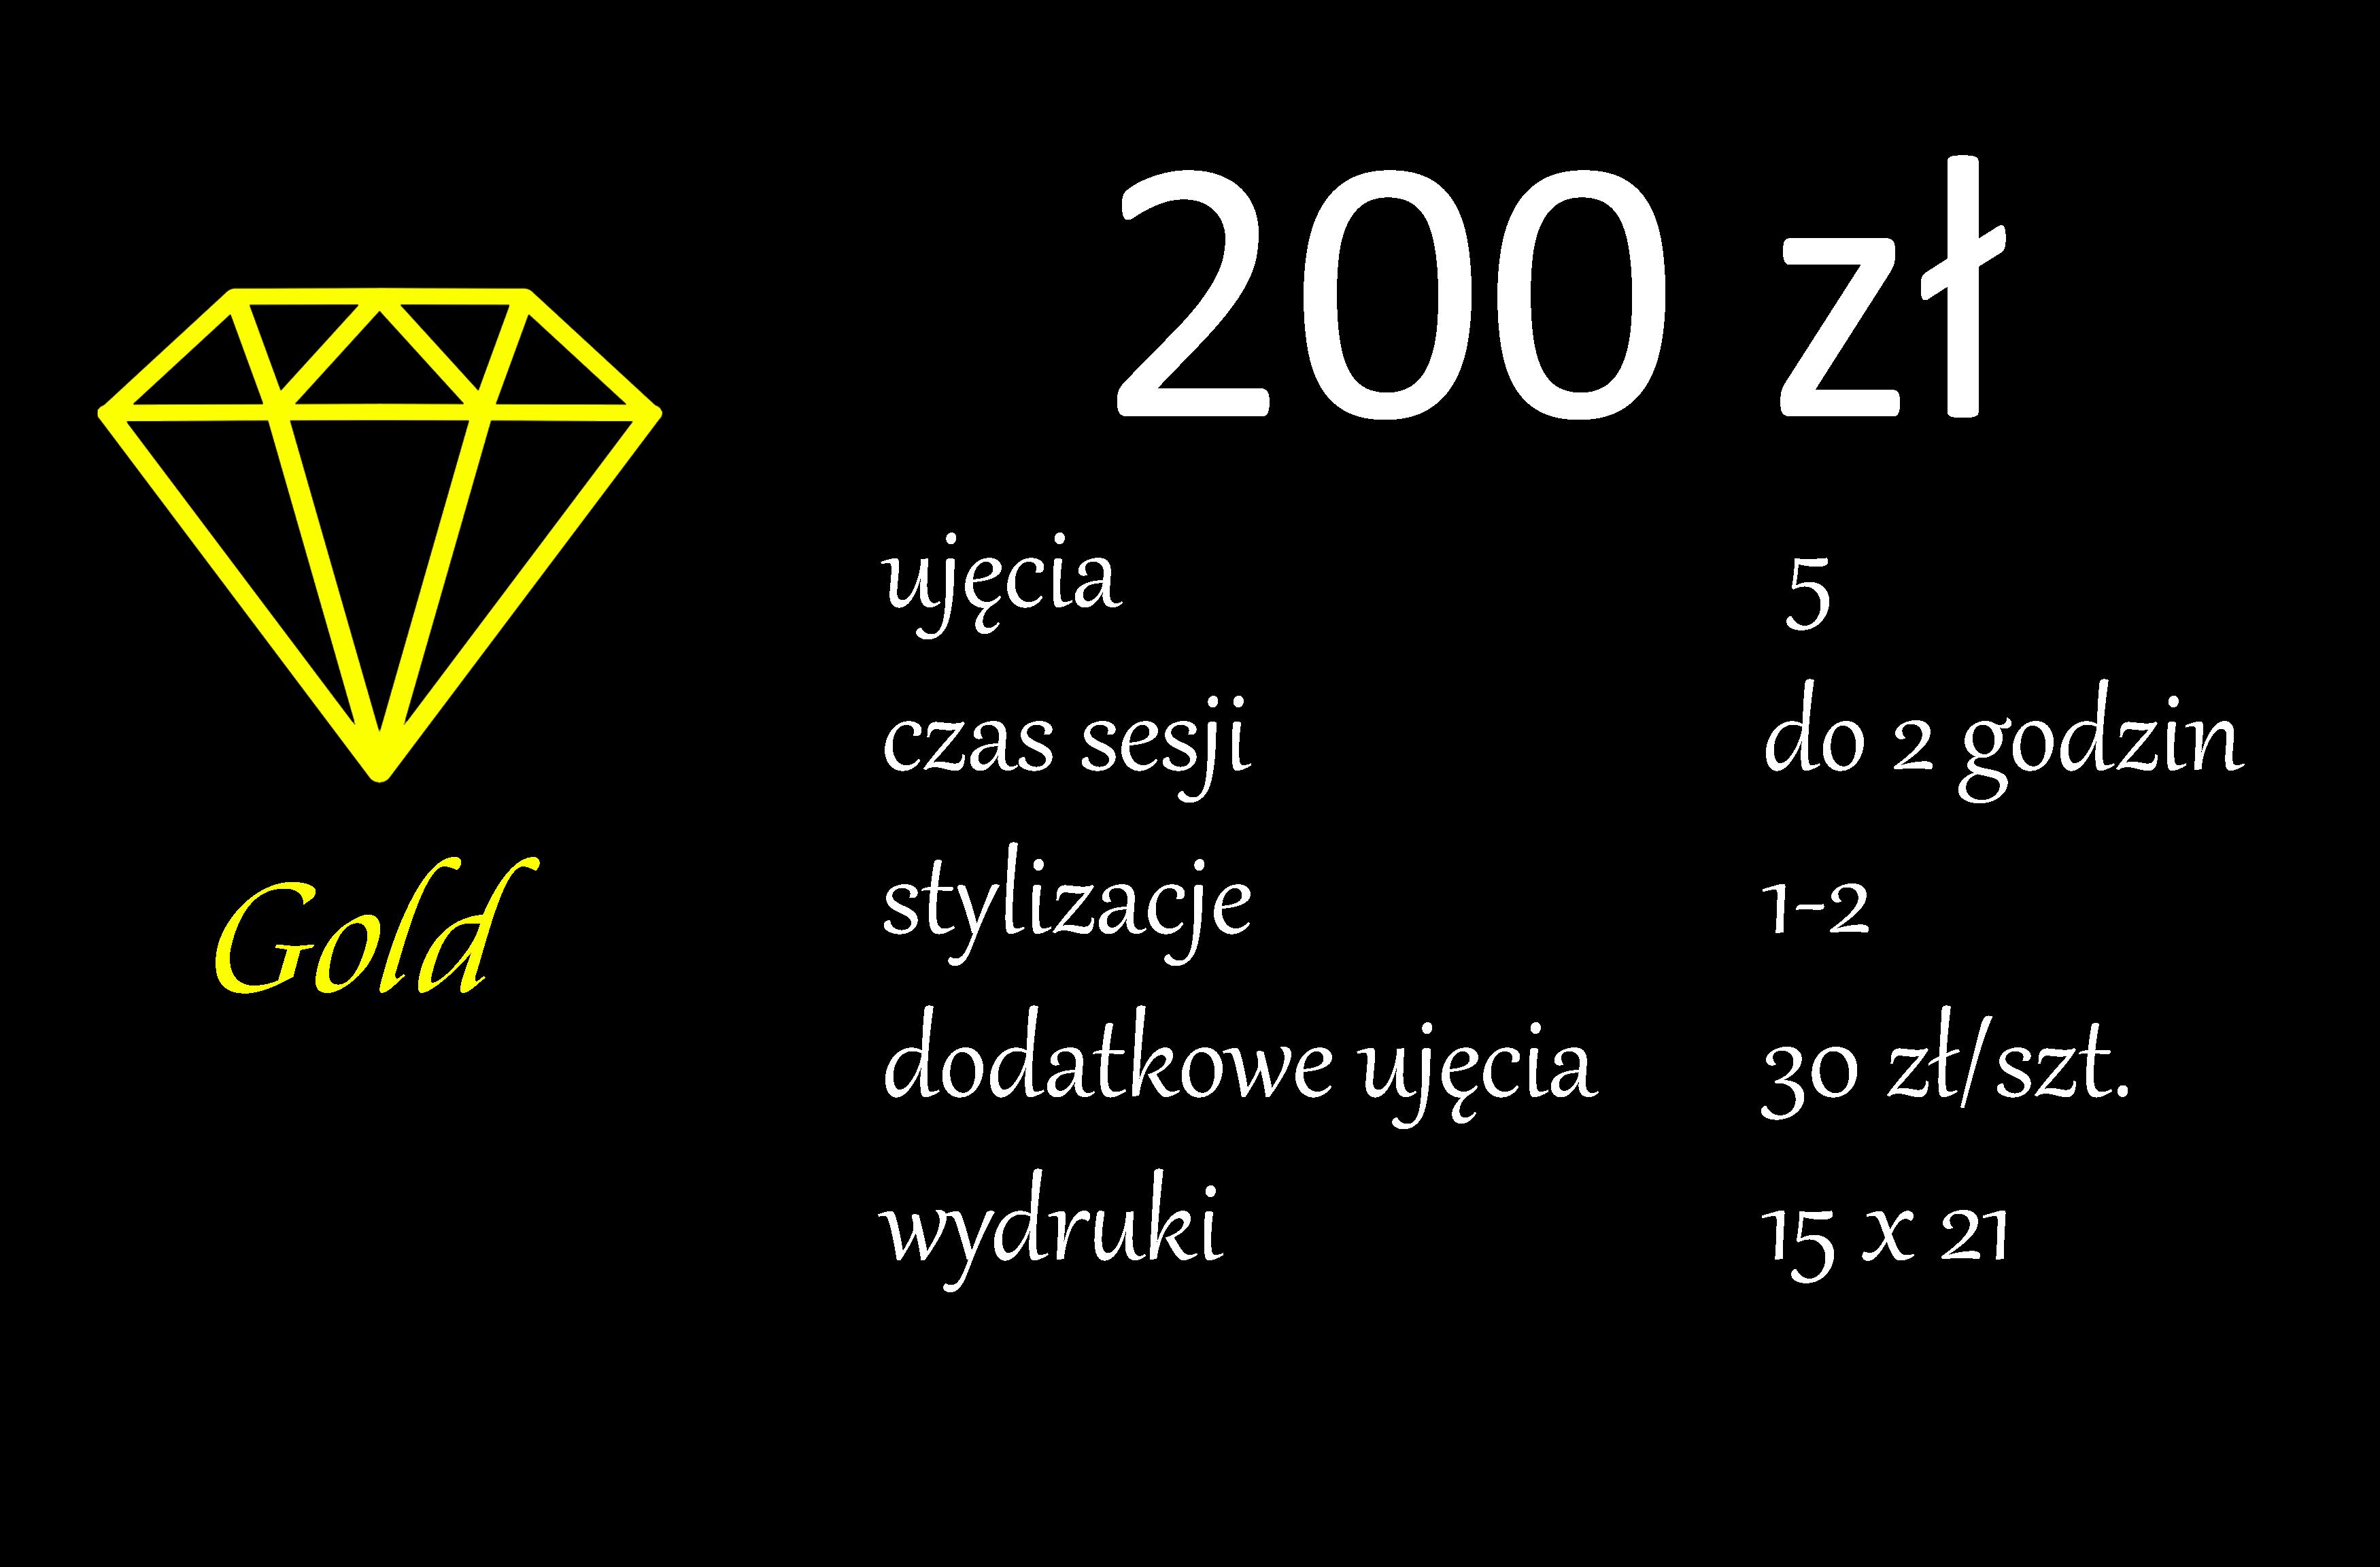 rodzinna_gold